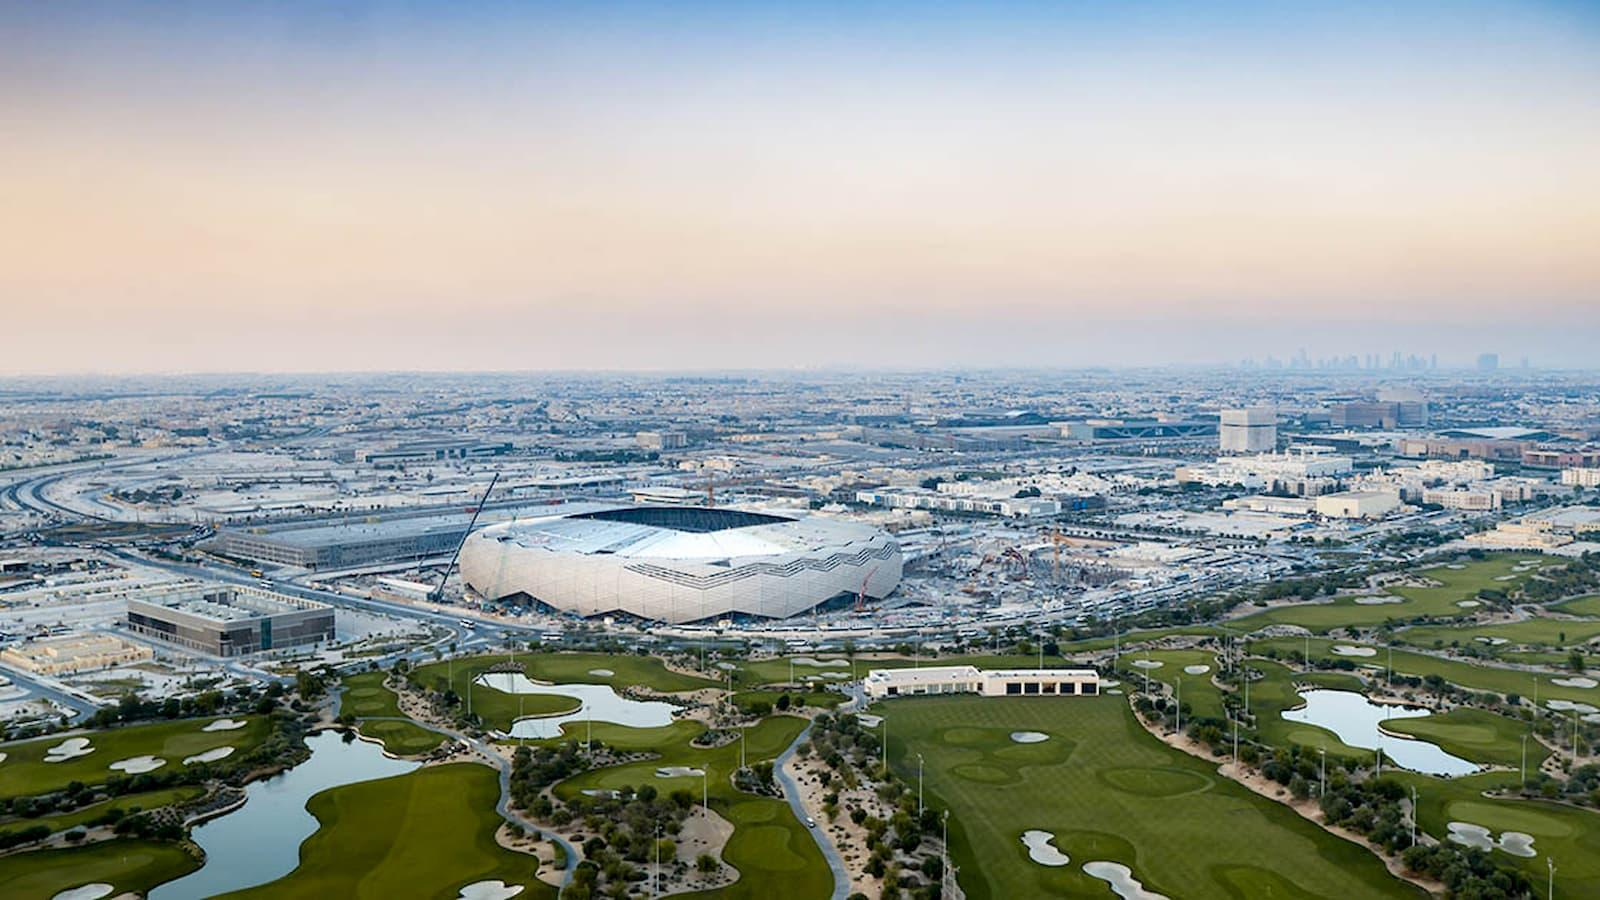 Qatar to host pan-Arab tournament in December 2021